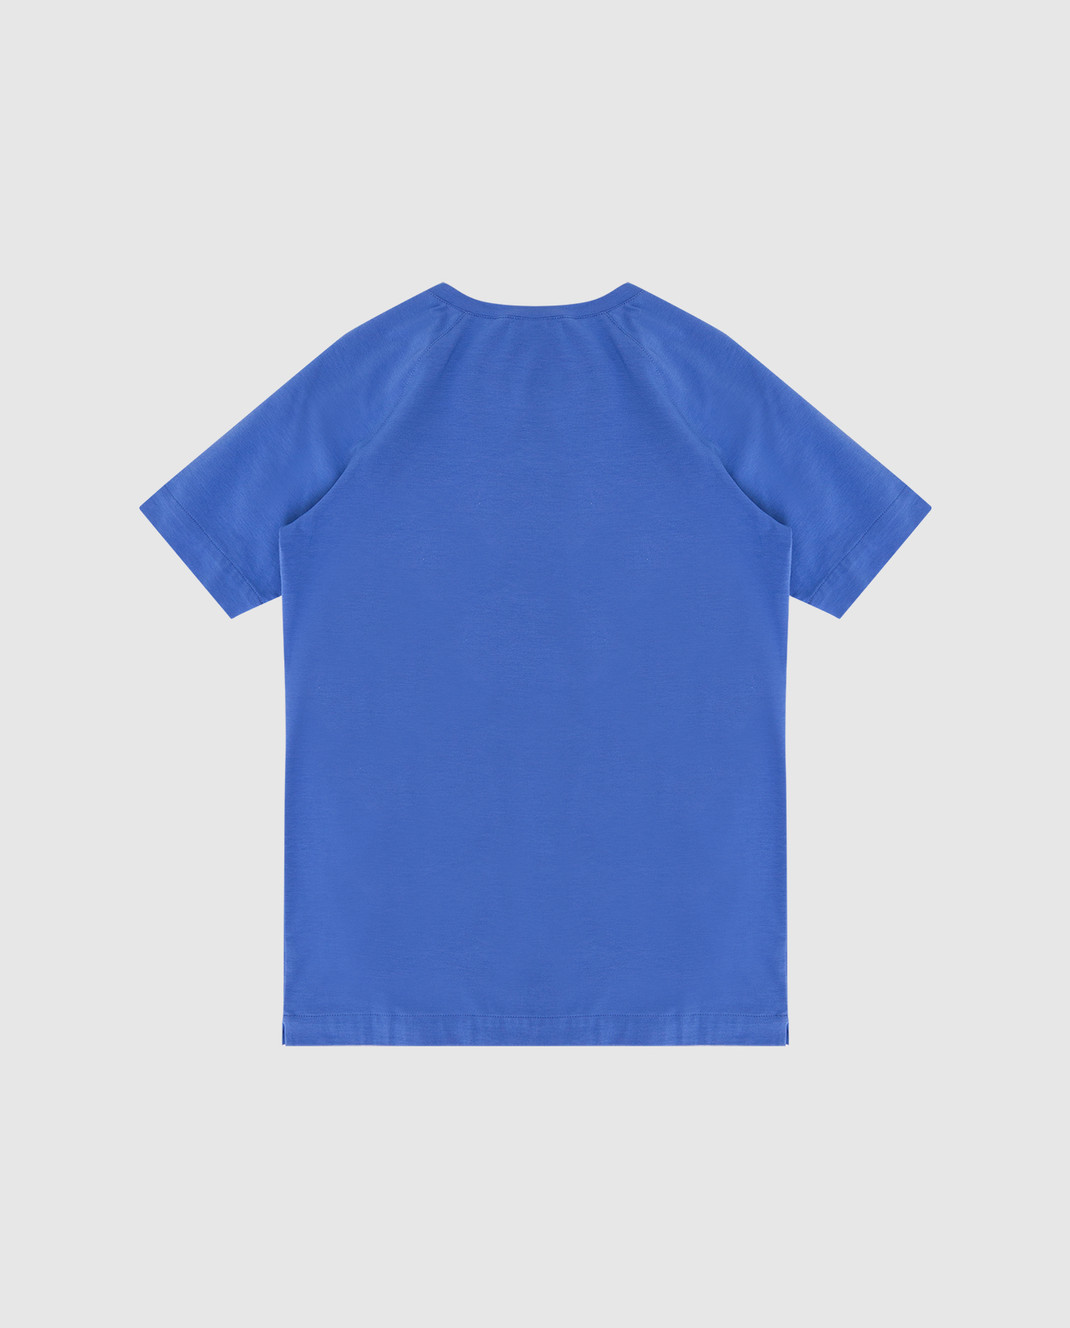 Loro Piana Детская синяя футболка F2FAI0800 изображение 2